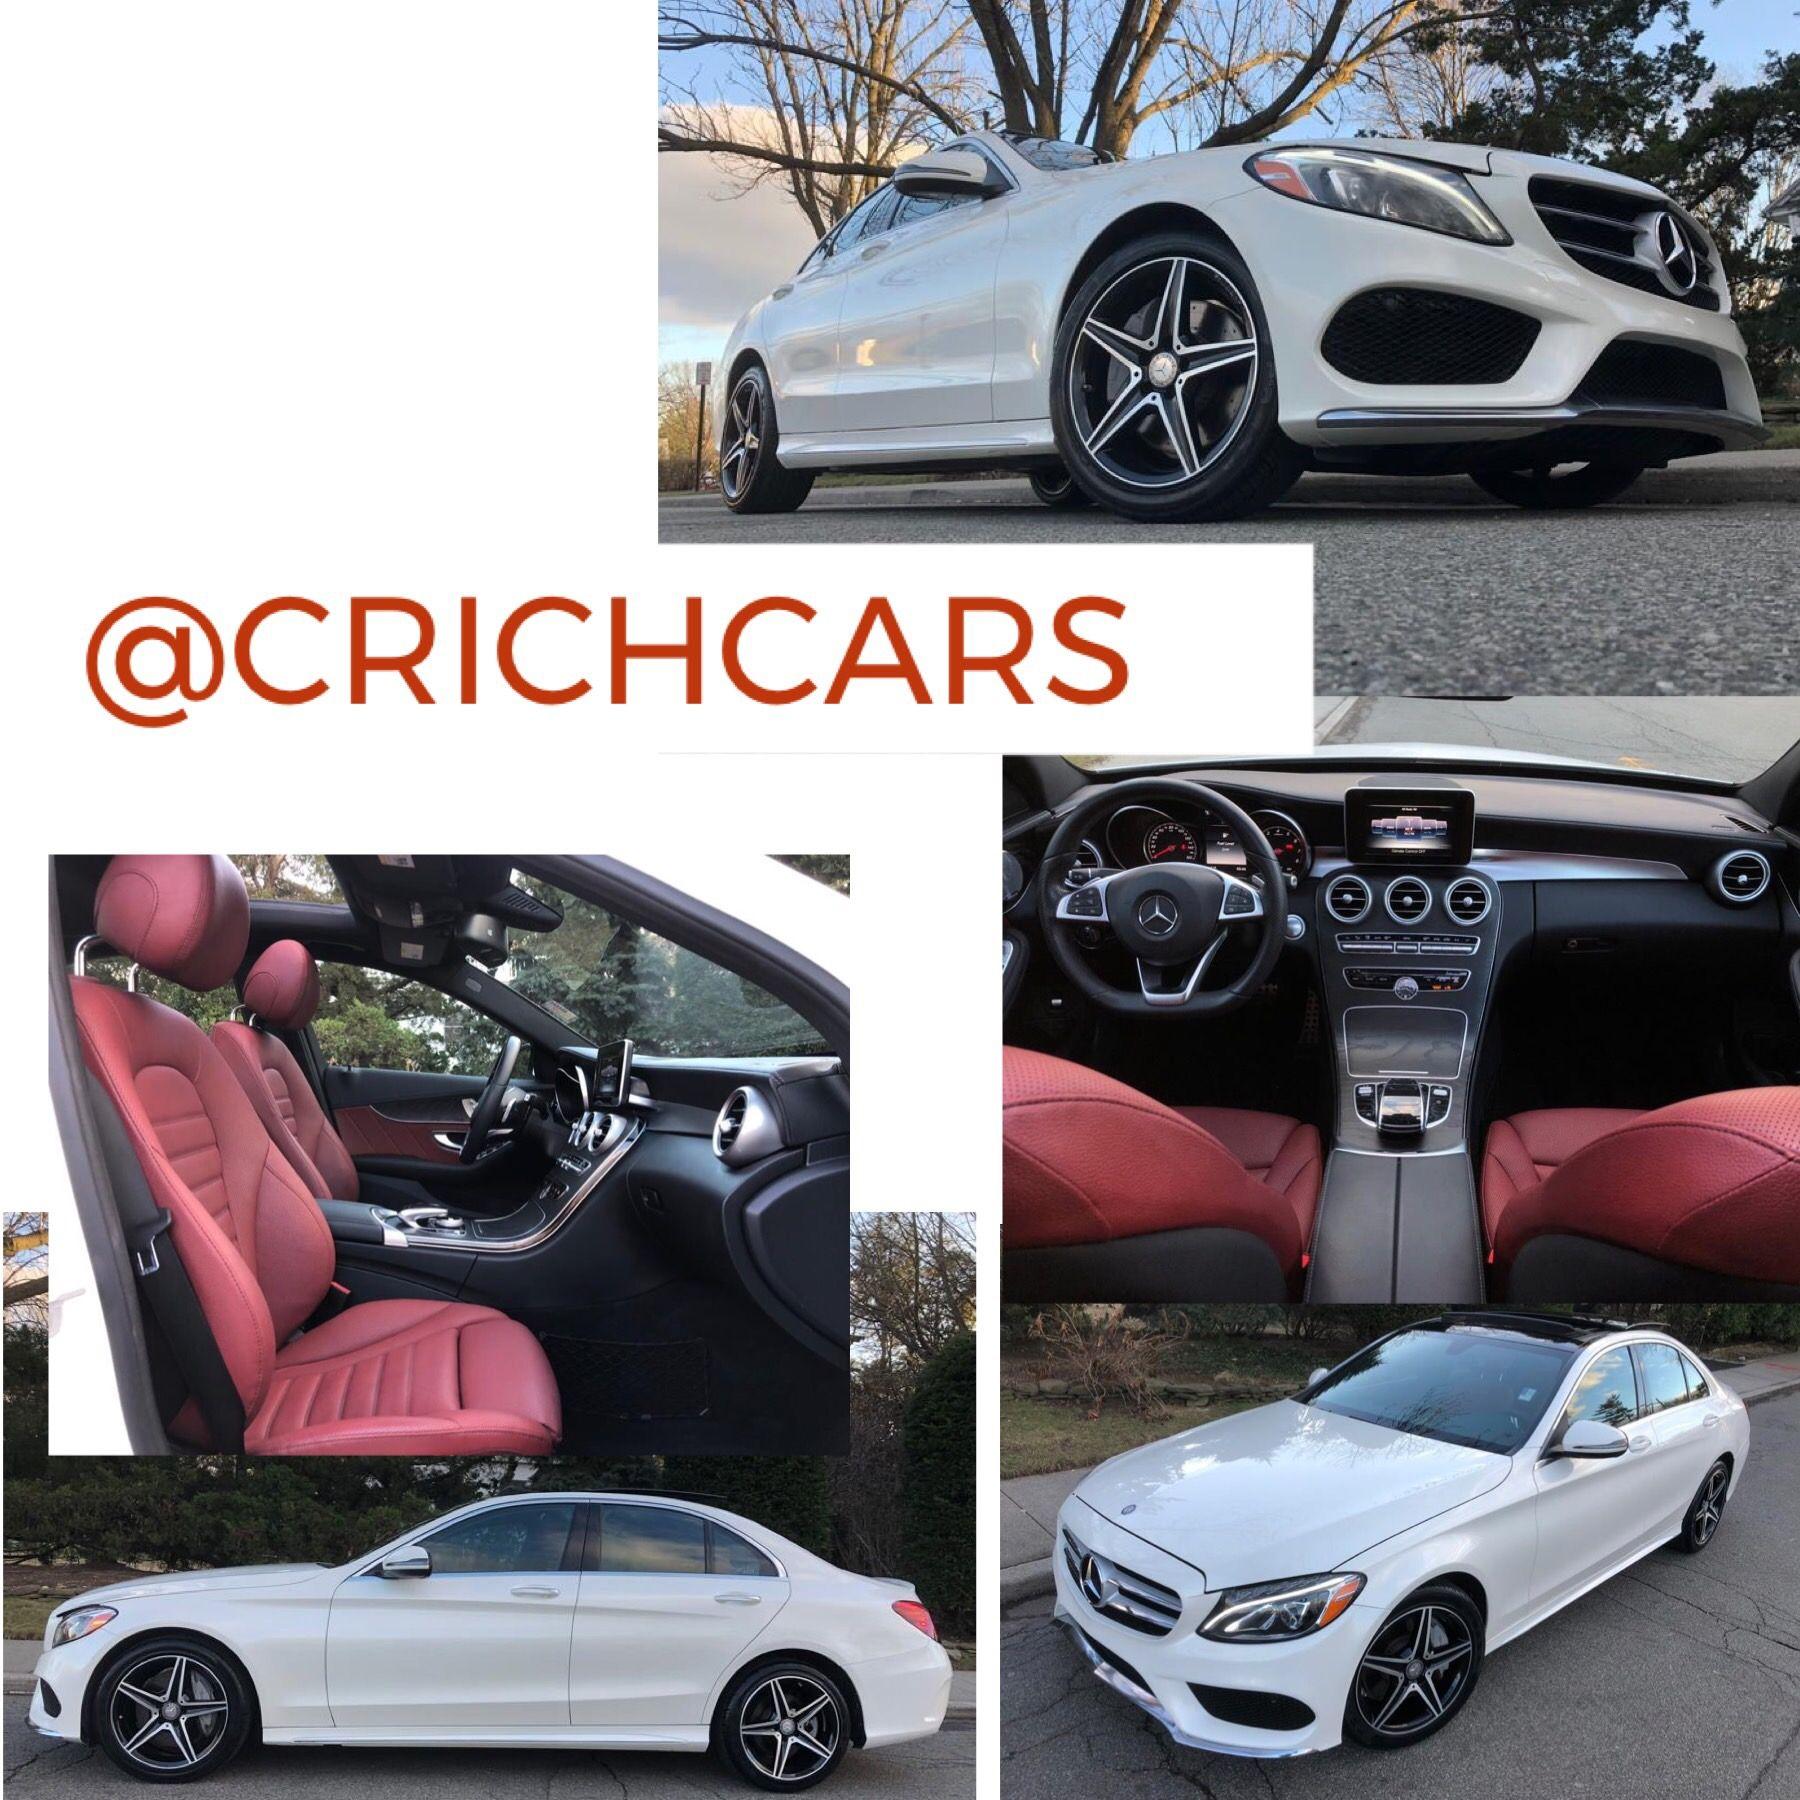 2016 Mercedes-Benz C-Class 4dr Sdn C300 Sport 4MATIC 22K